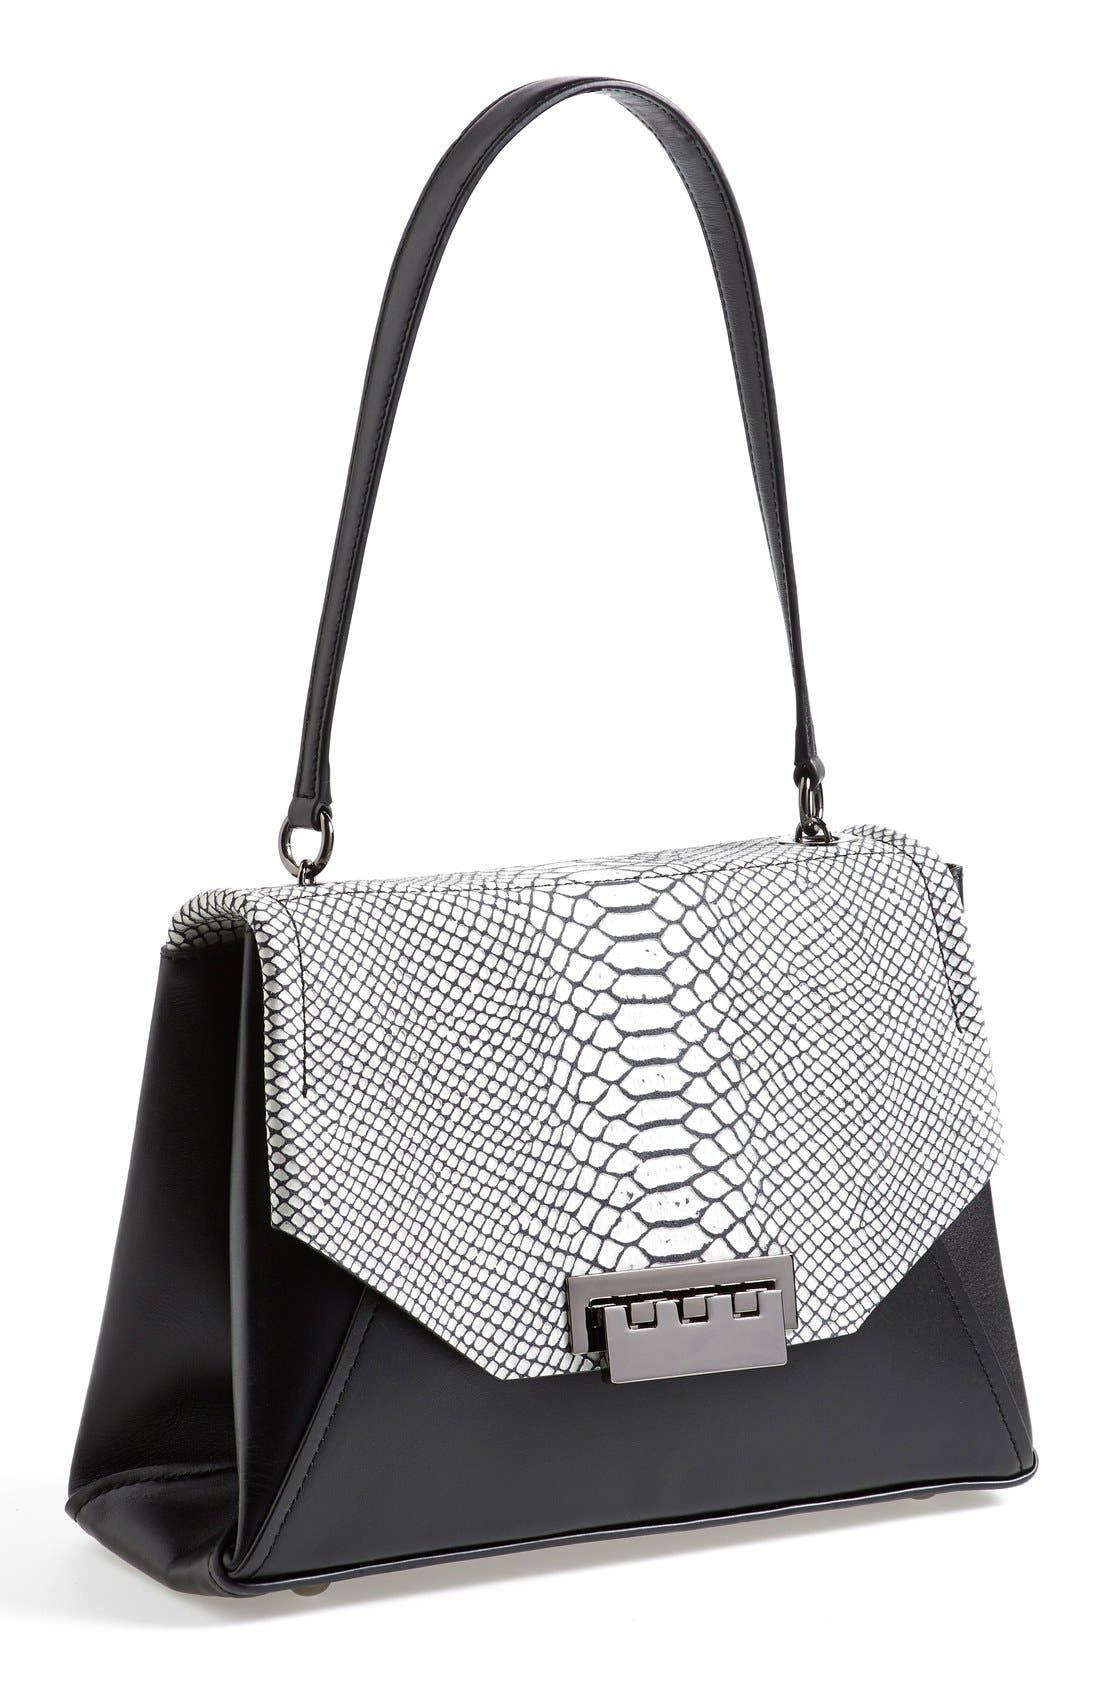 Alternate Image 1 Selected - ZAC Zac Posen 'Eartha' Envelope Flap Shoulder Bag